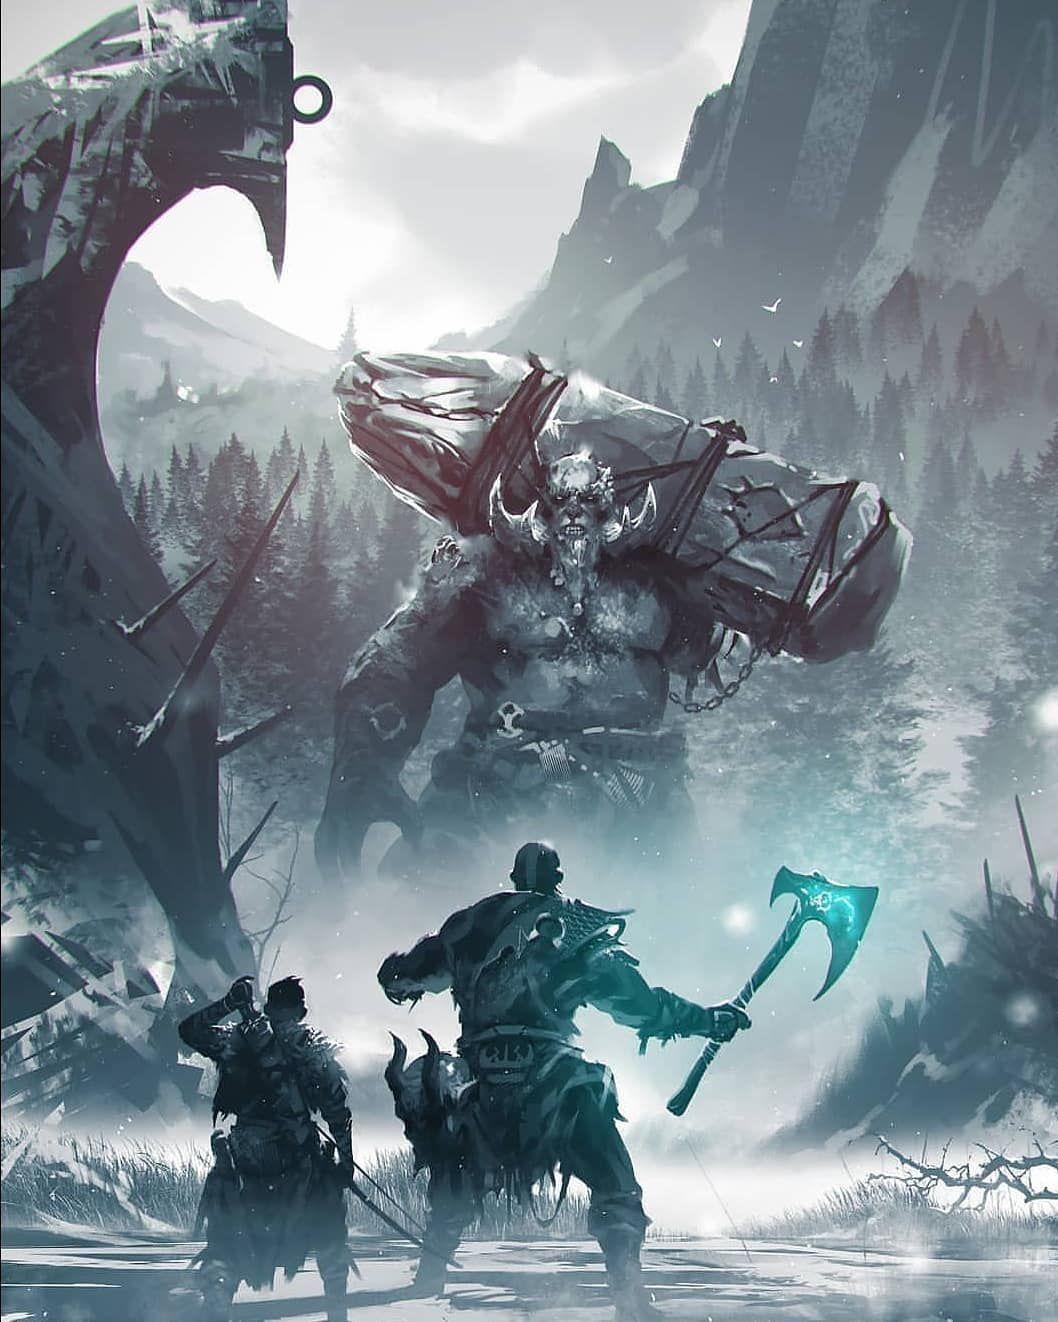 Moalins World Art Page On Instagram God Of War By Kalmahul Godofwar Artclubcommunion Comingofbe God Of War Kratos God Of War World Art